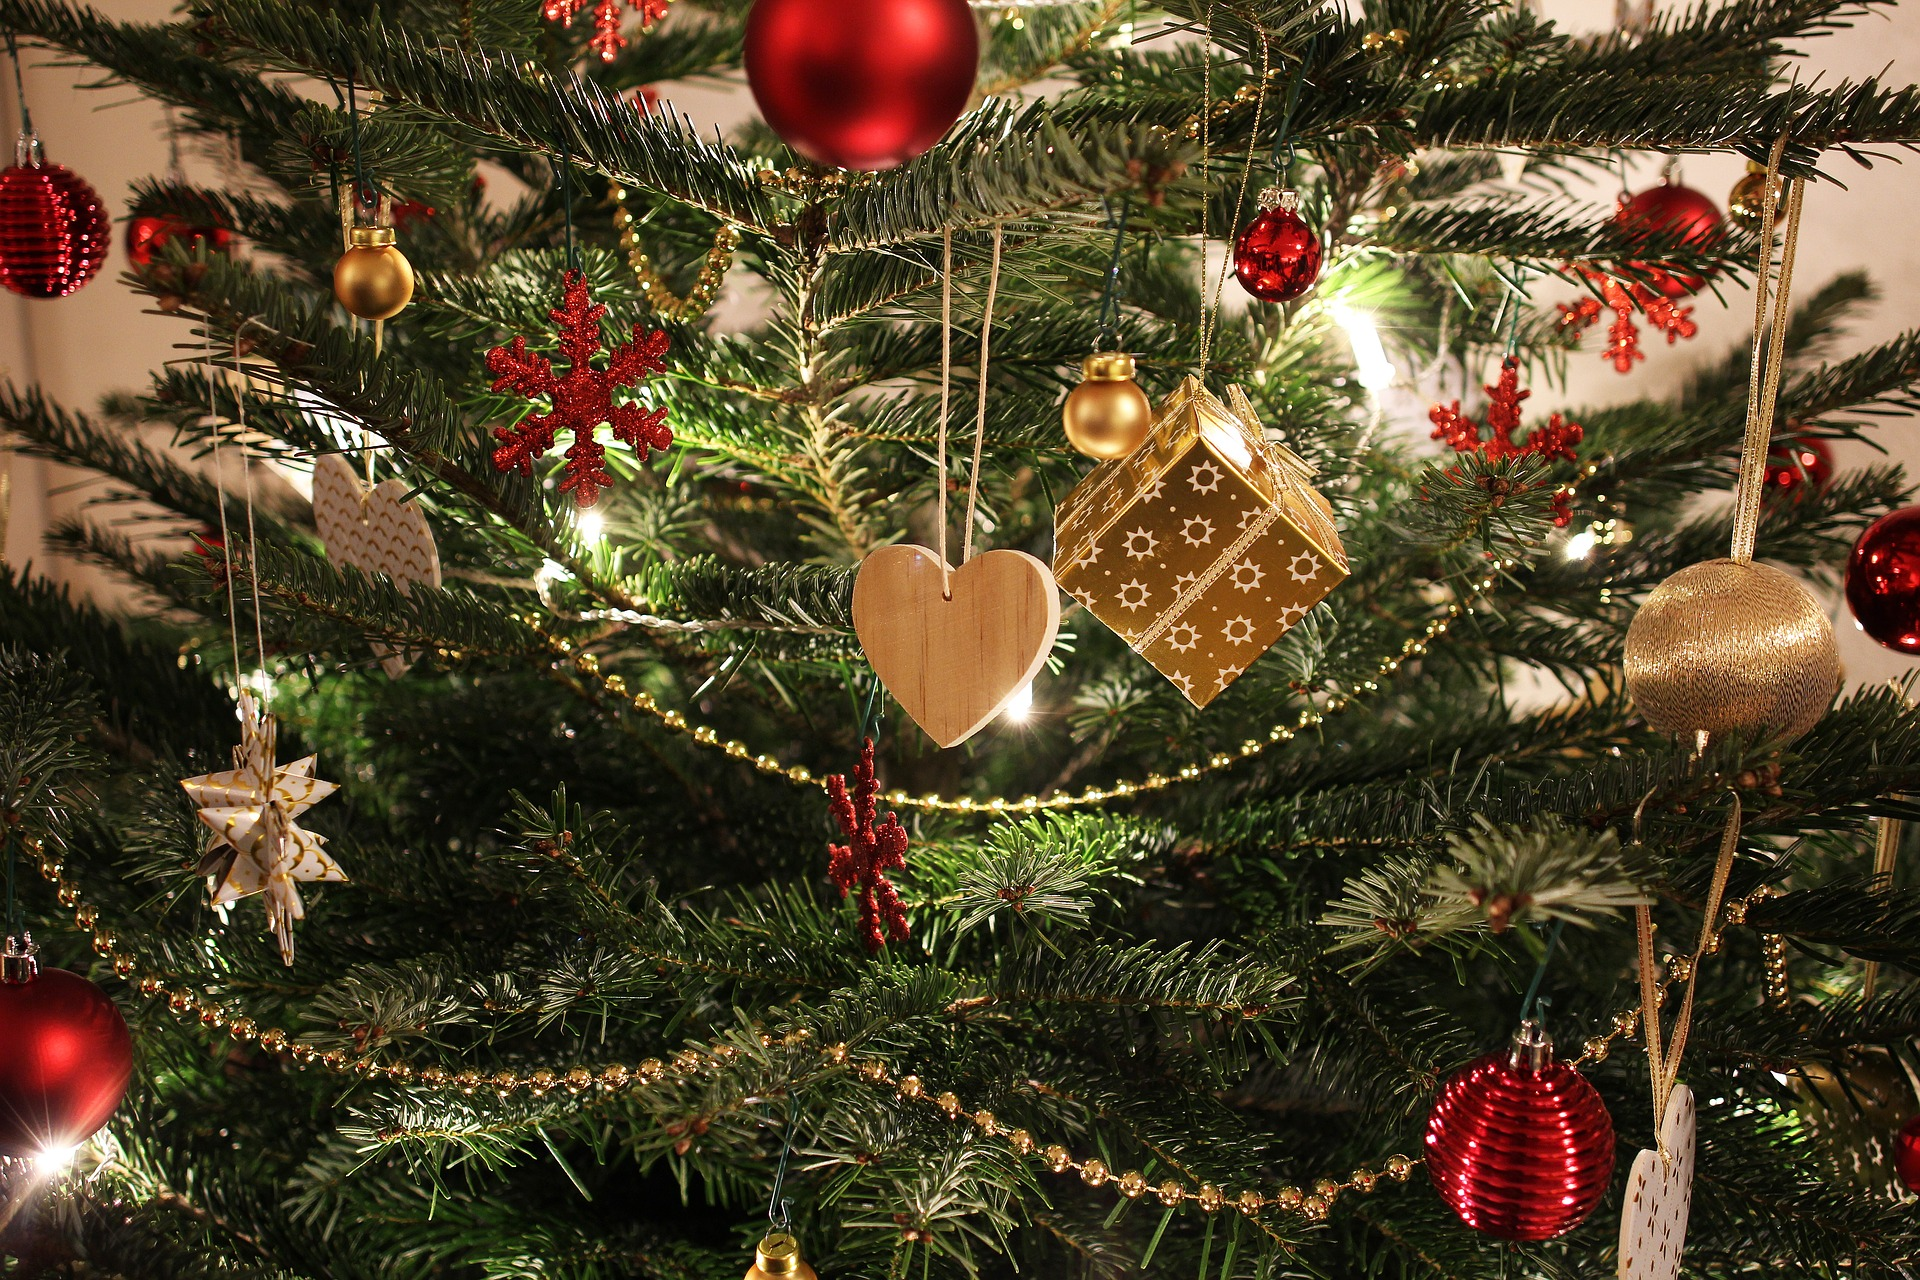 It's already Christmas at Residential Resort Cumbre del Sol